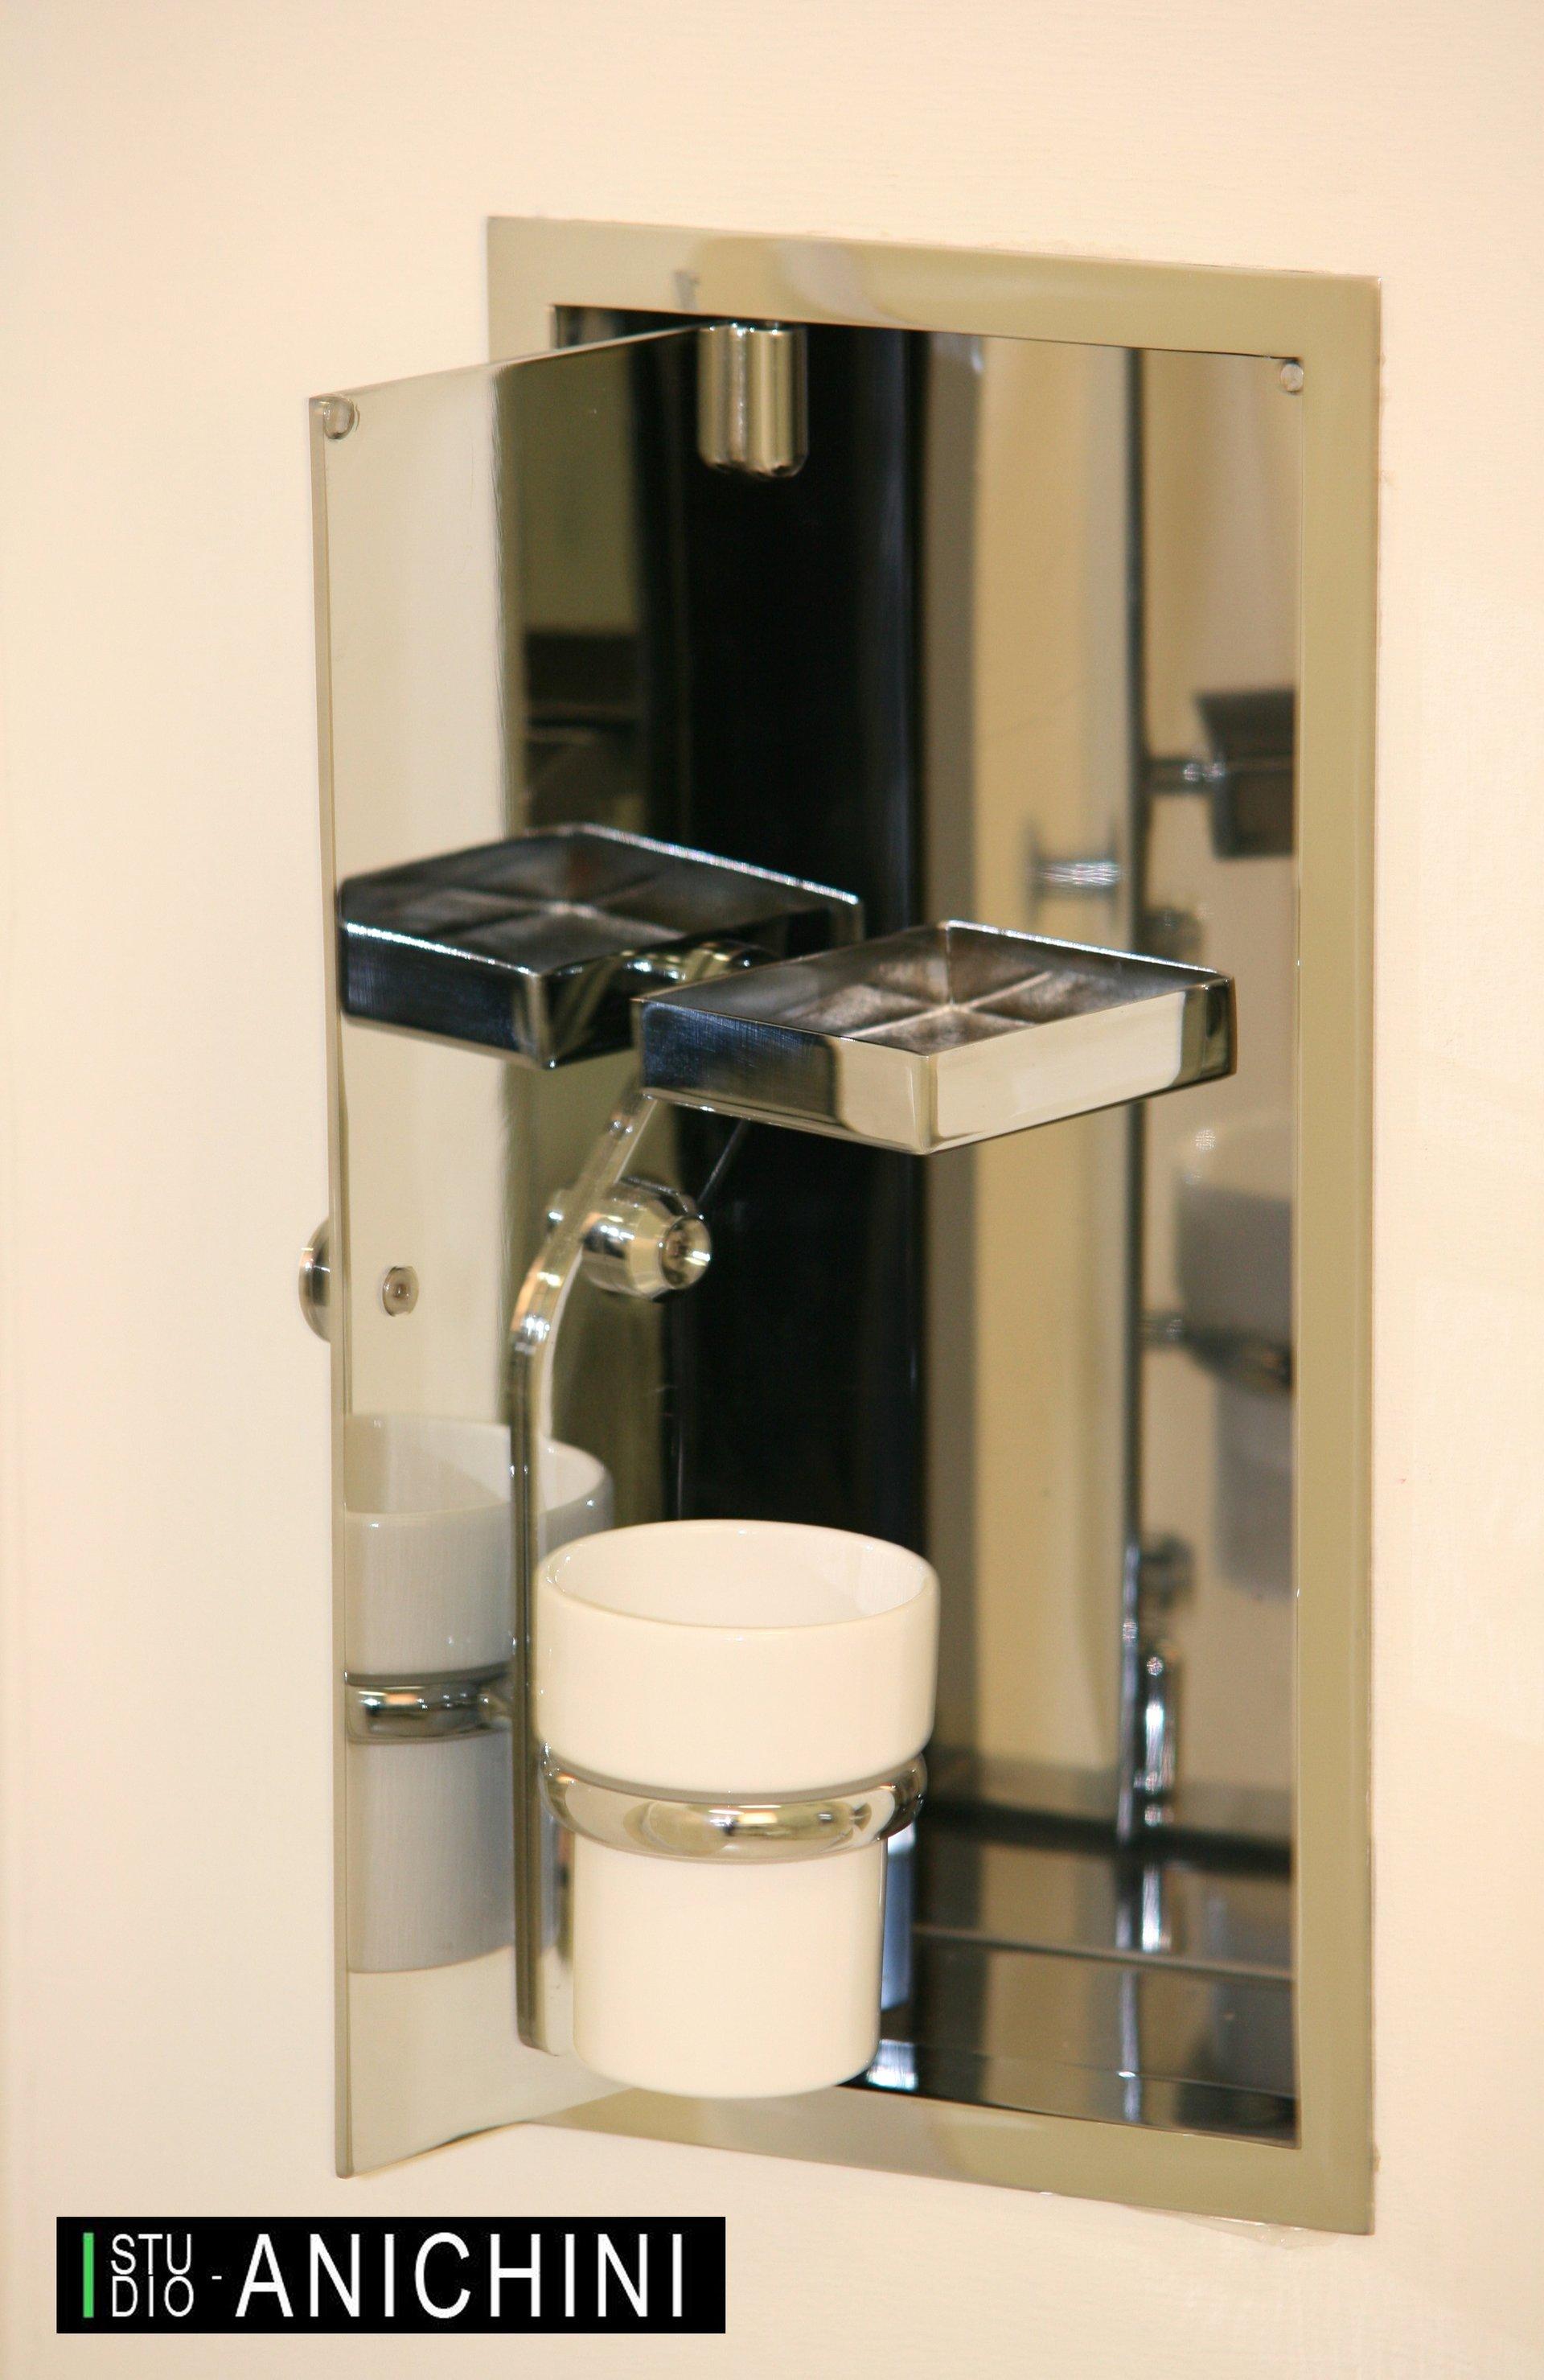 RECESSED ACCESSORIESMichele Bonan Collection   Florence   Studio Anichini. Porta Bathroom Fittings. Home Design Ideas